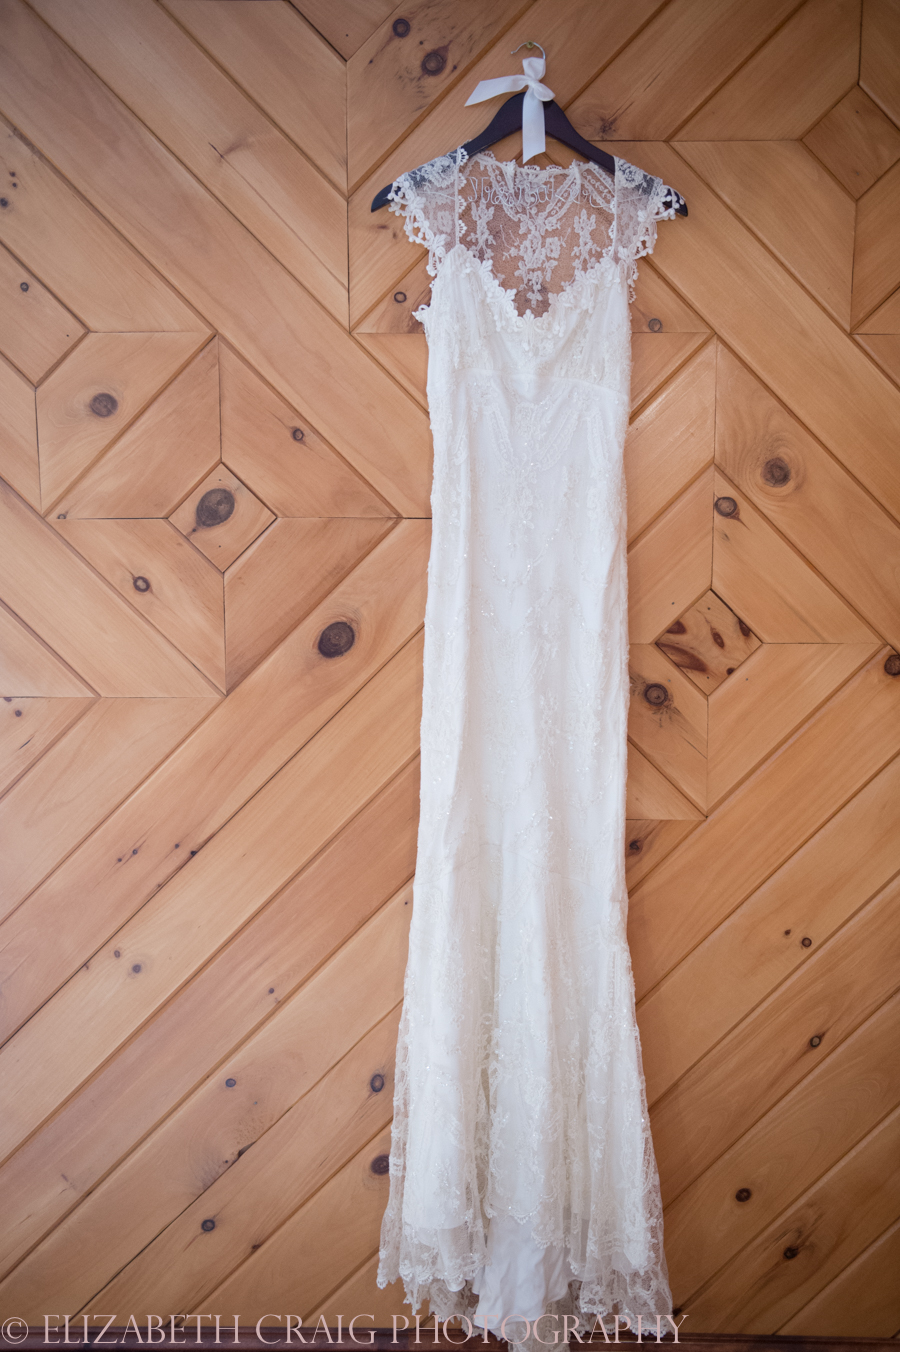 Dubois Brockway St. Marys PA Weddings-0026